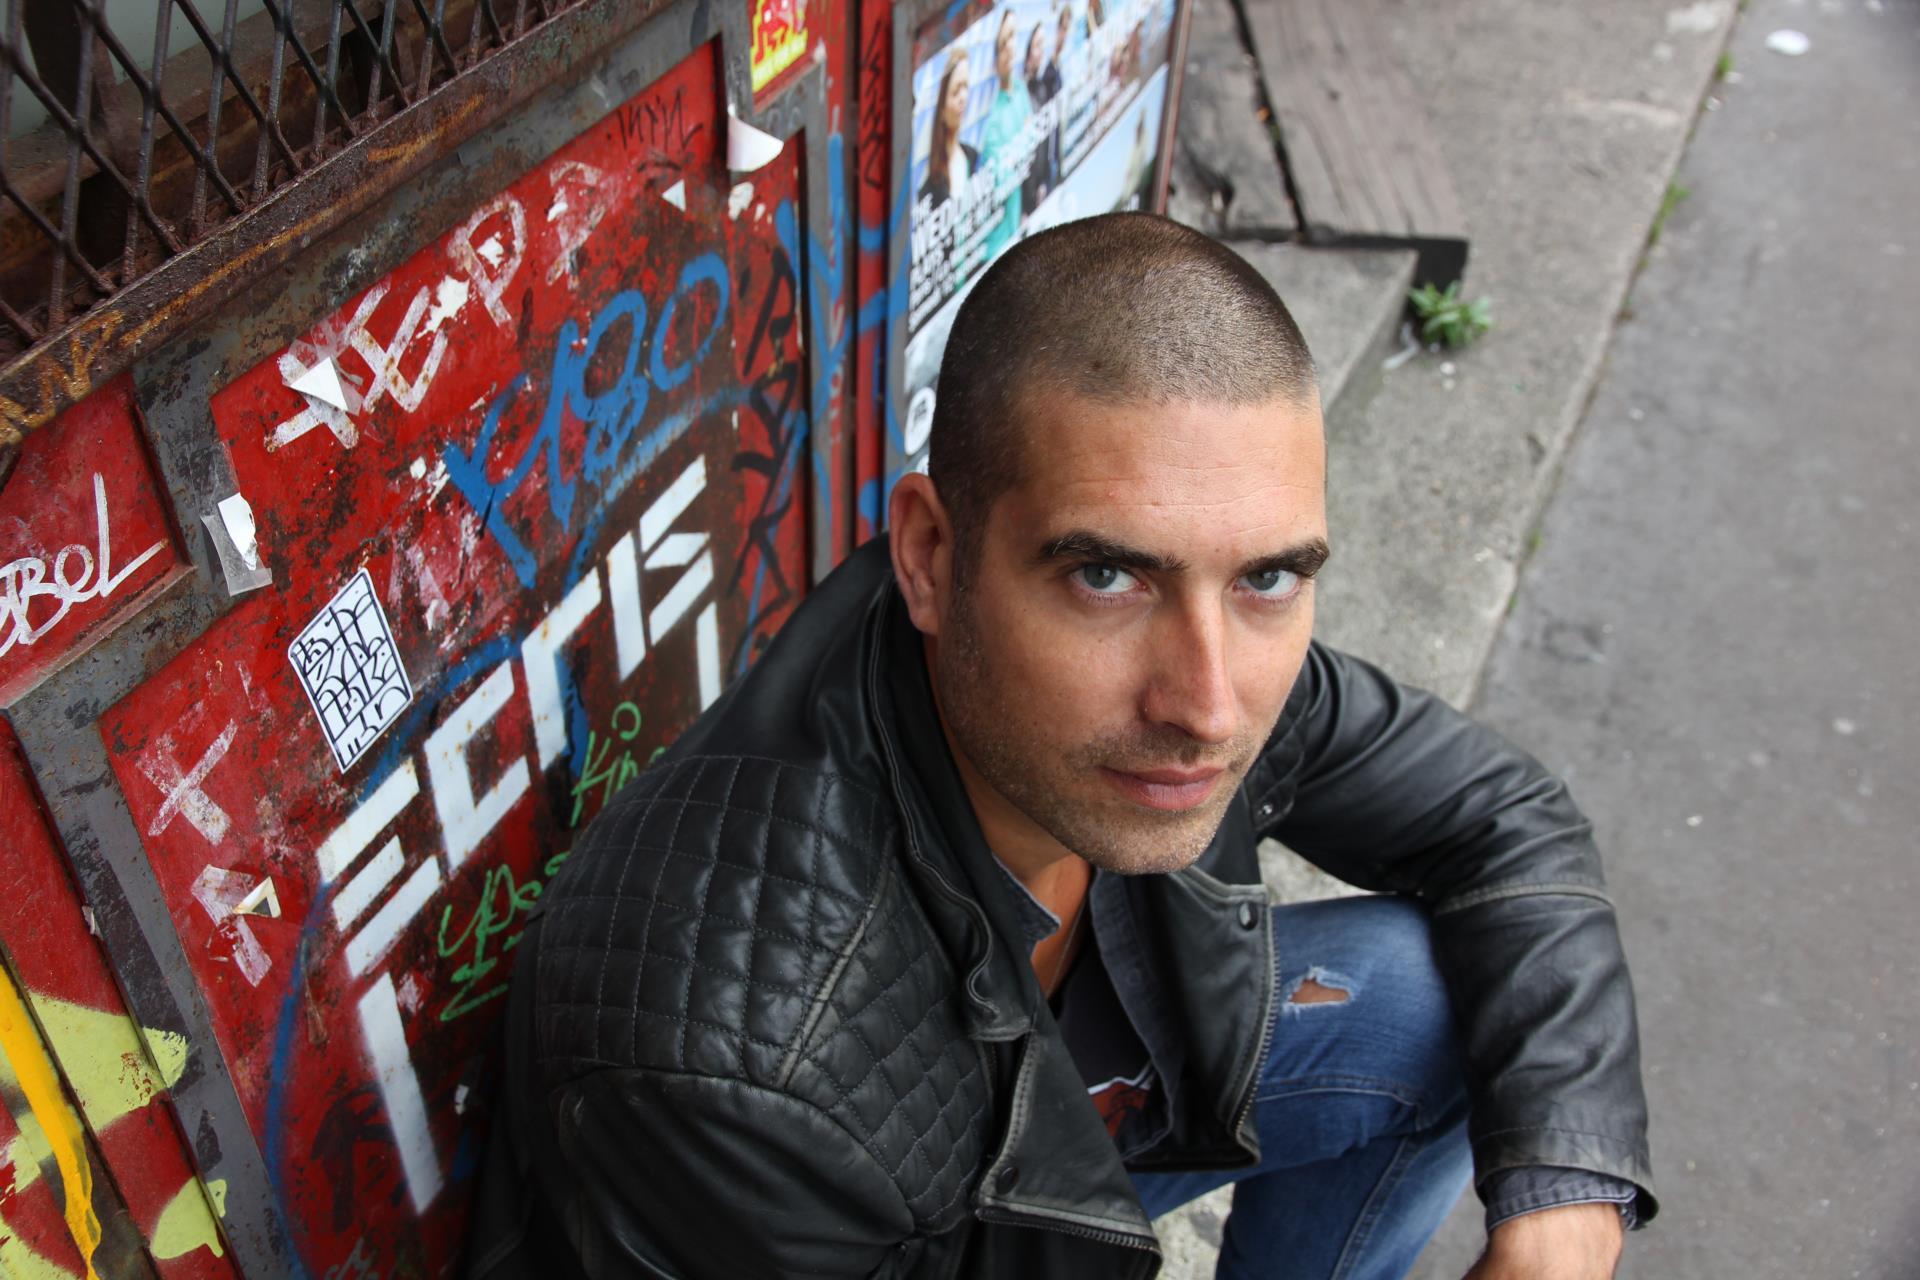 soiree electro cannes popof dj electro nice cannes tendances soiree electro antibe soiree vertigo nice